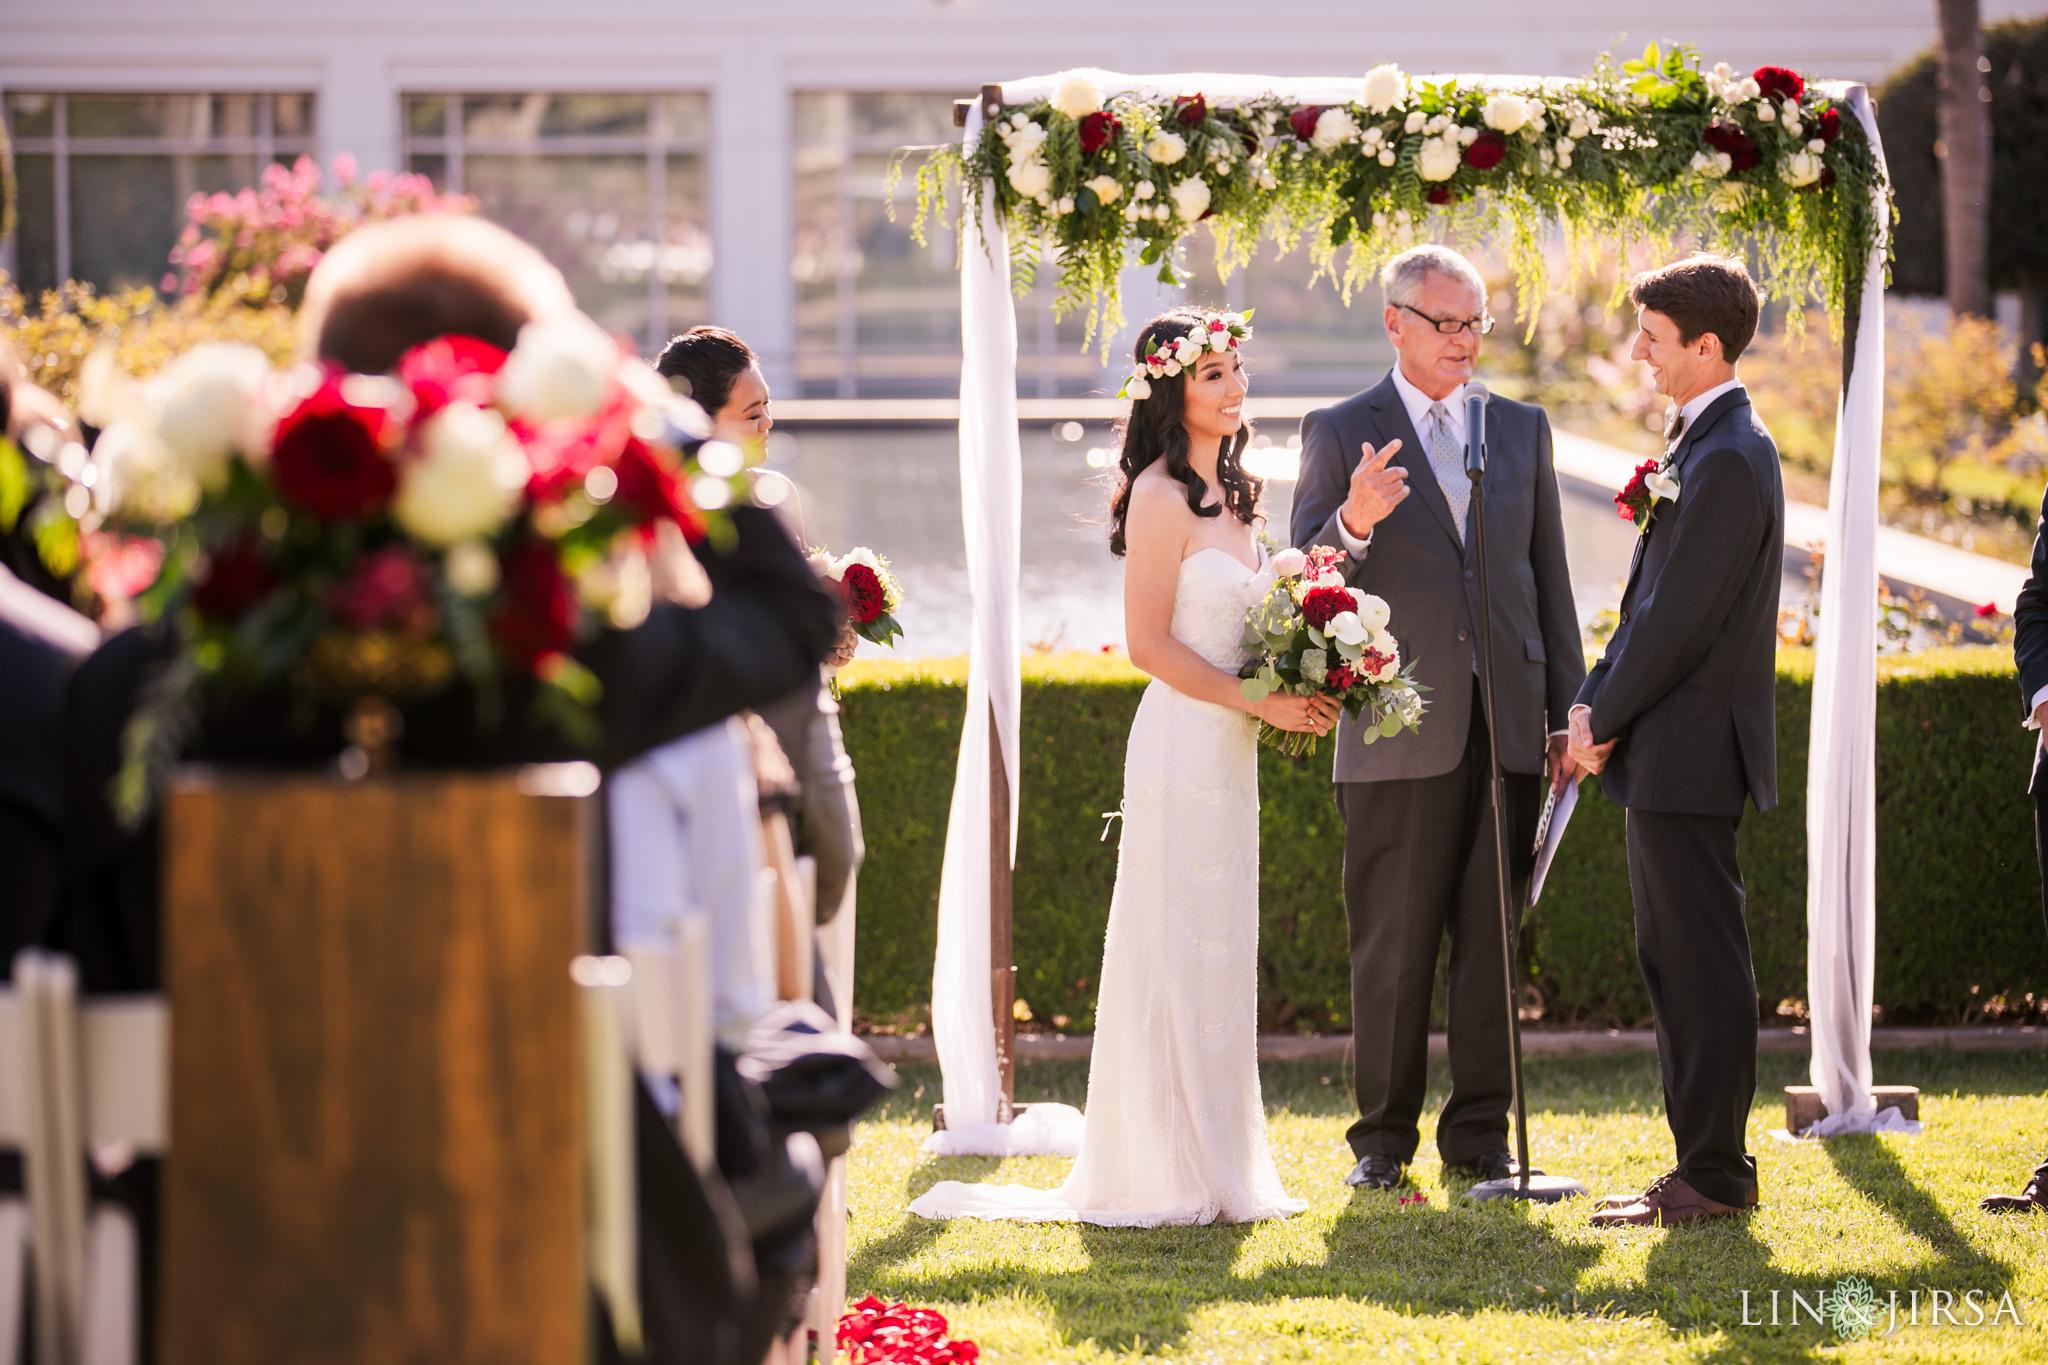 020 richard nixon library wedding ceremony photography 1